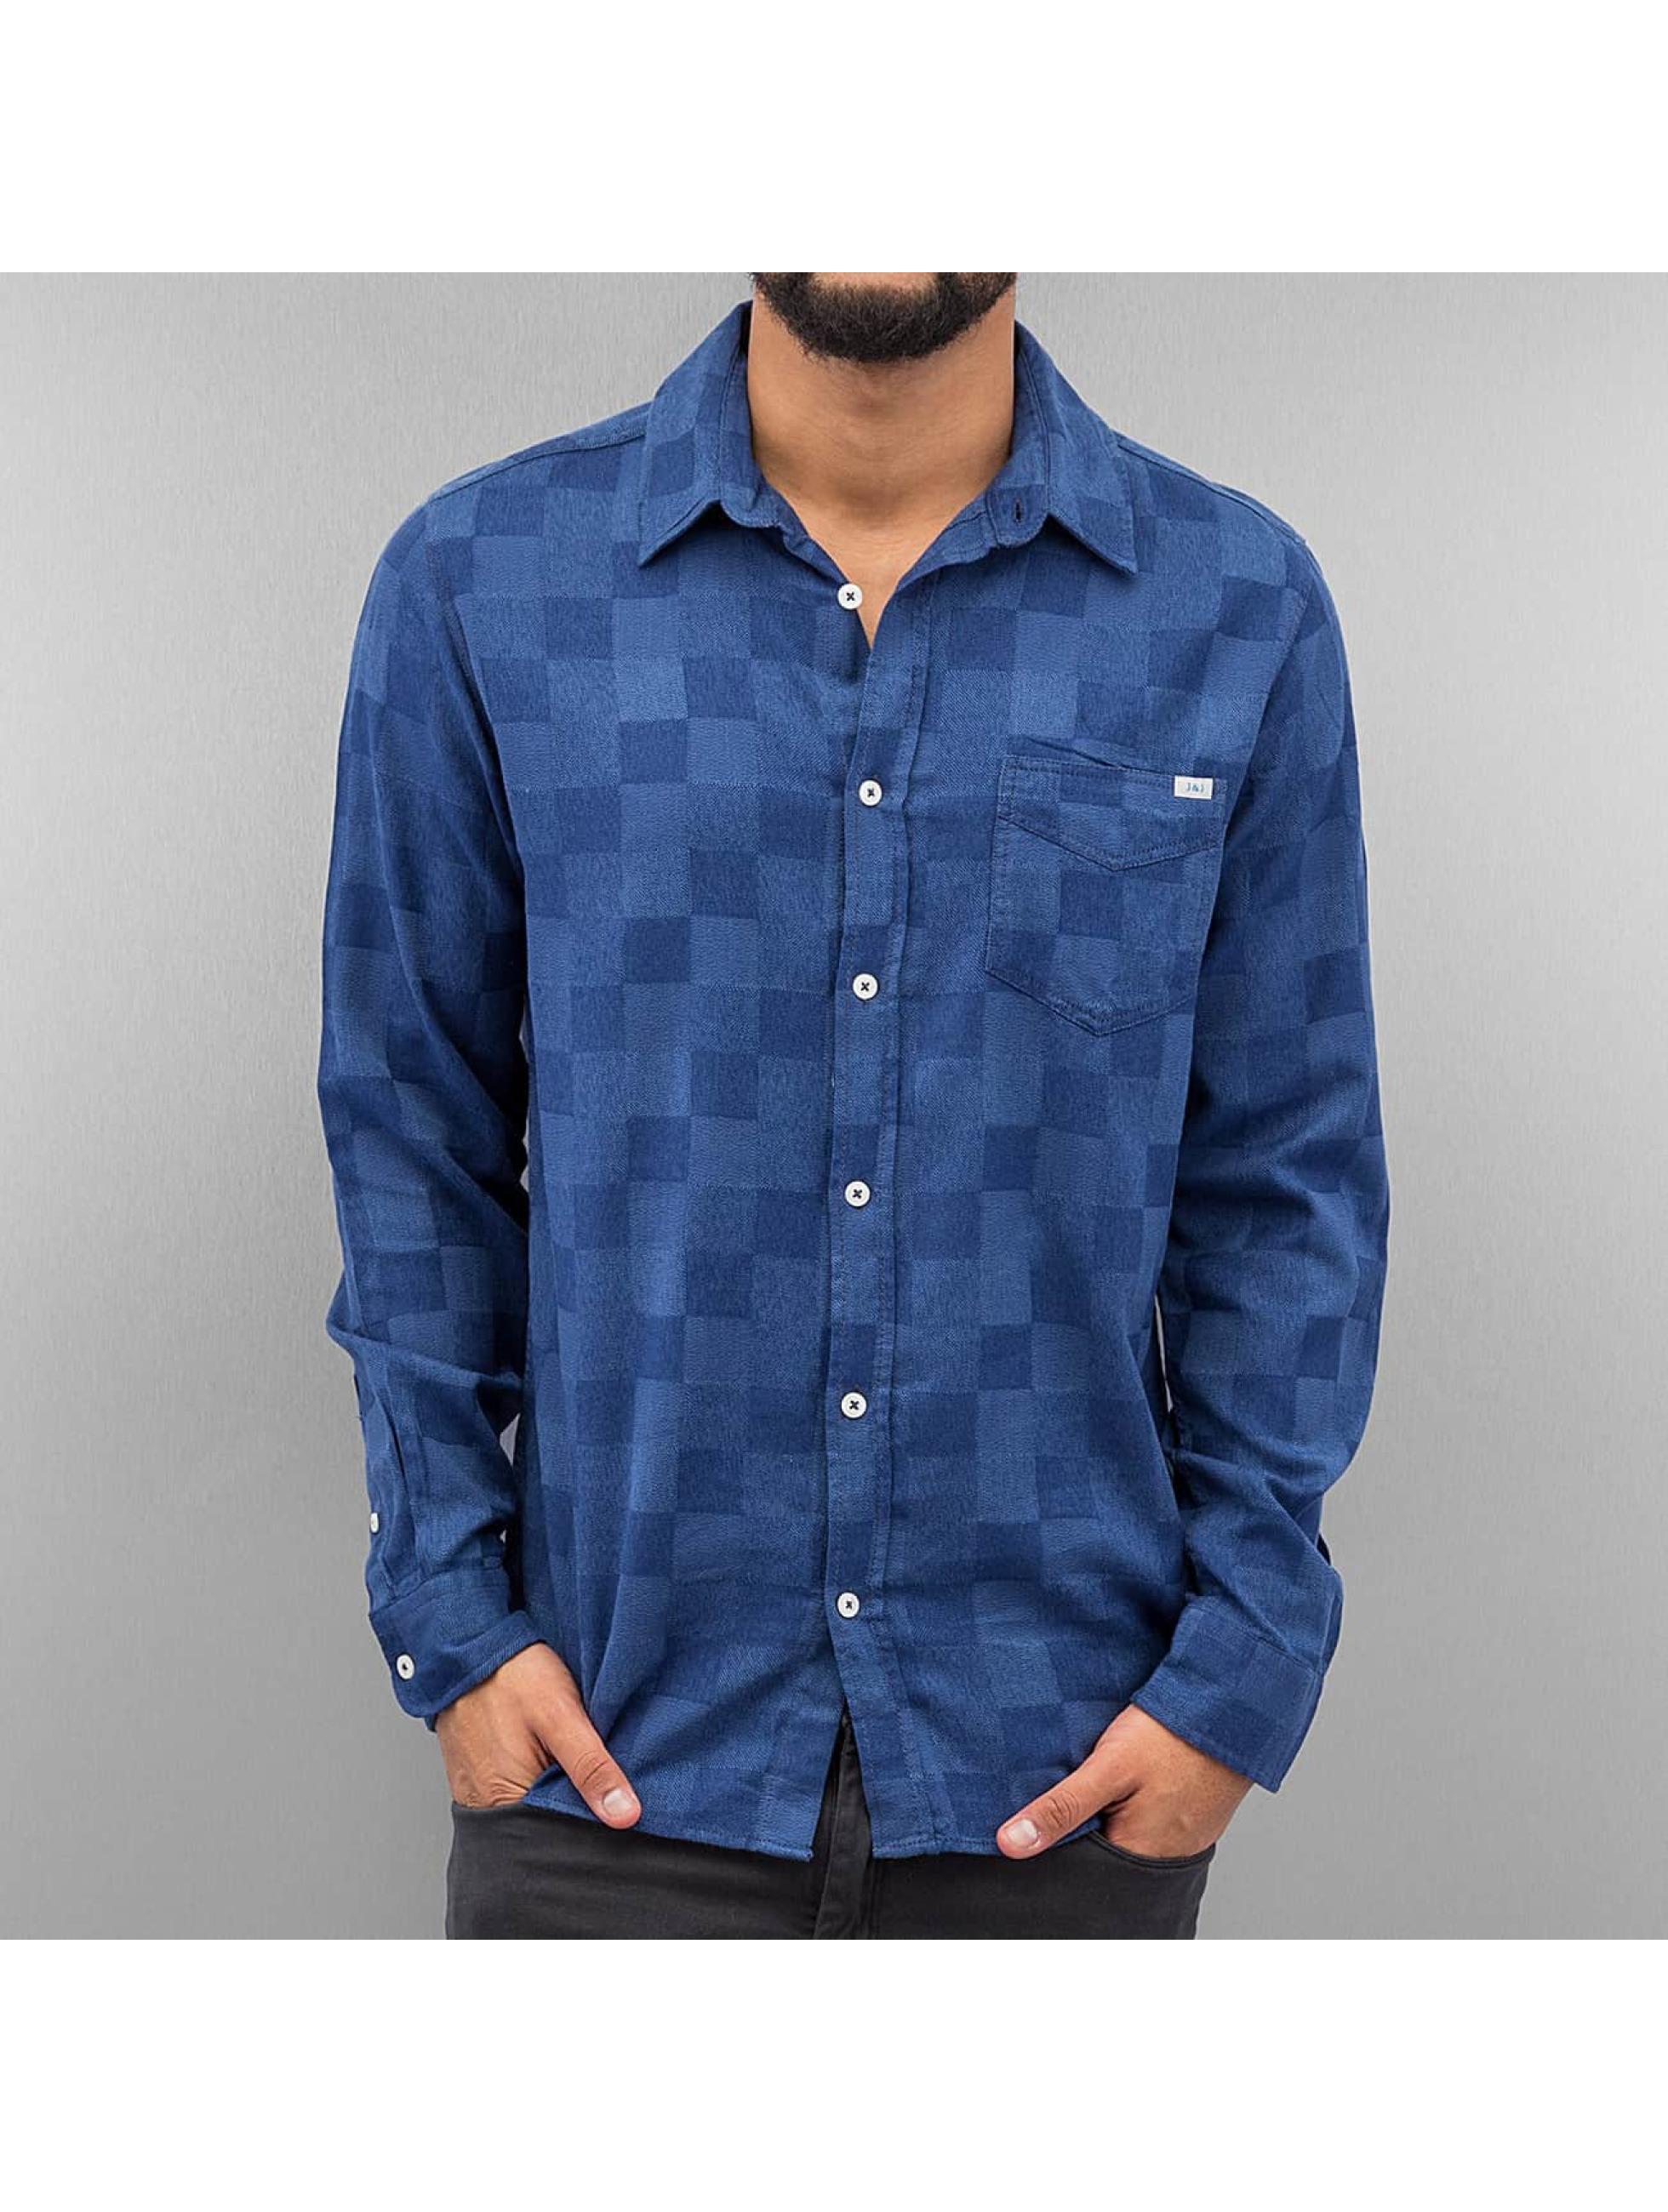 jack jones herren hemd jjleigh in blau 227299. Black Bedroom Furniture Sets. Home Design Ideas